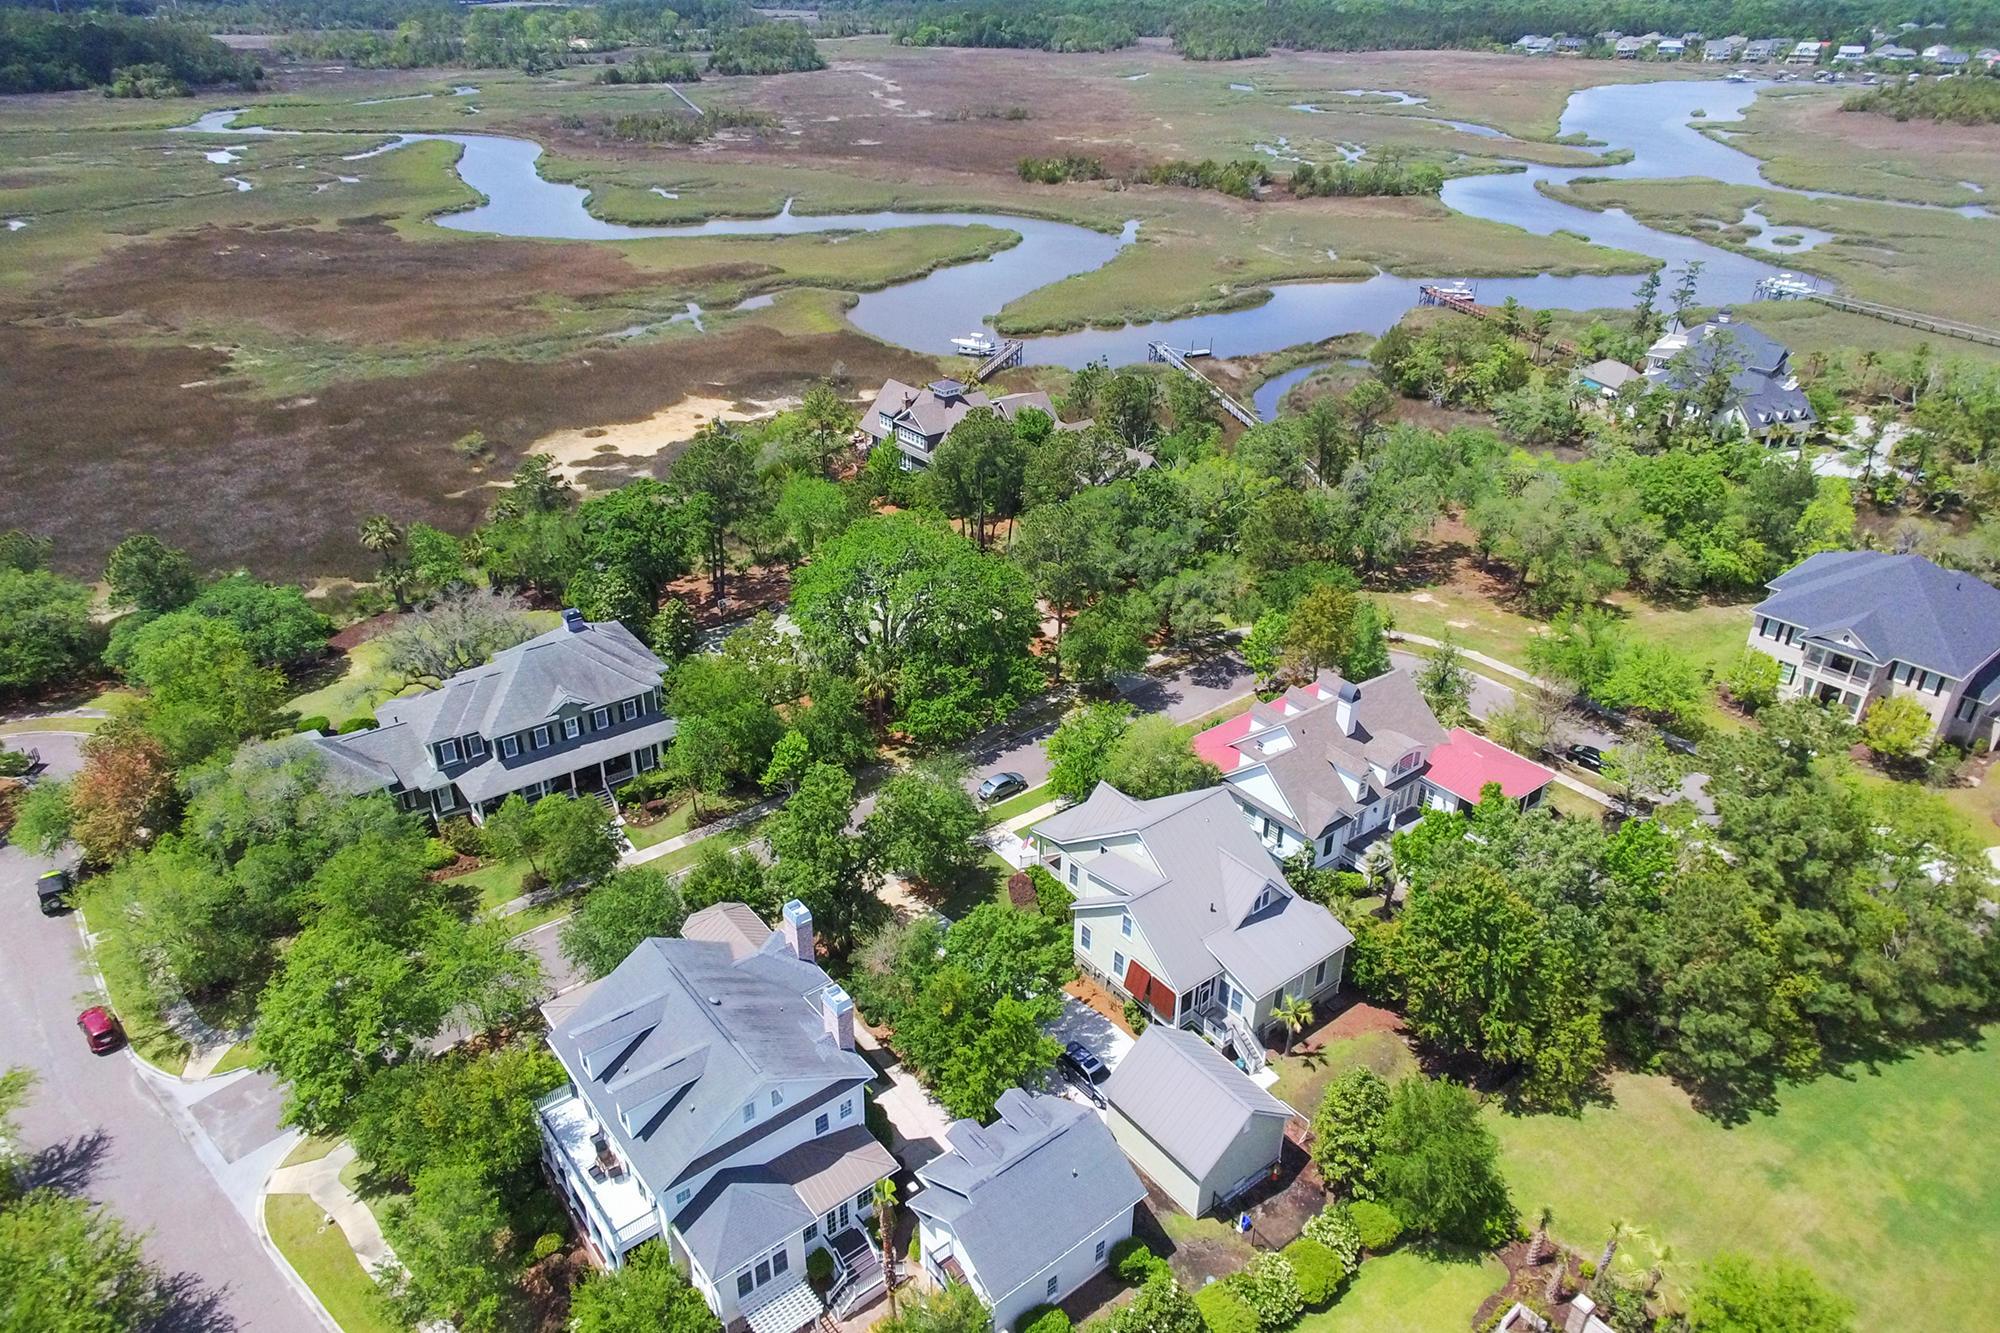 Daniel Island Park Homes For Sale - 1 Lafar, Daniel Island, SC - 4